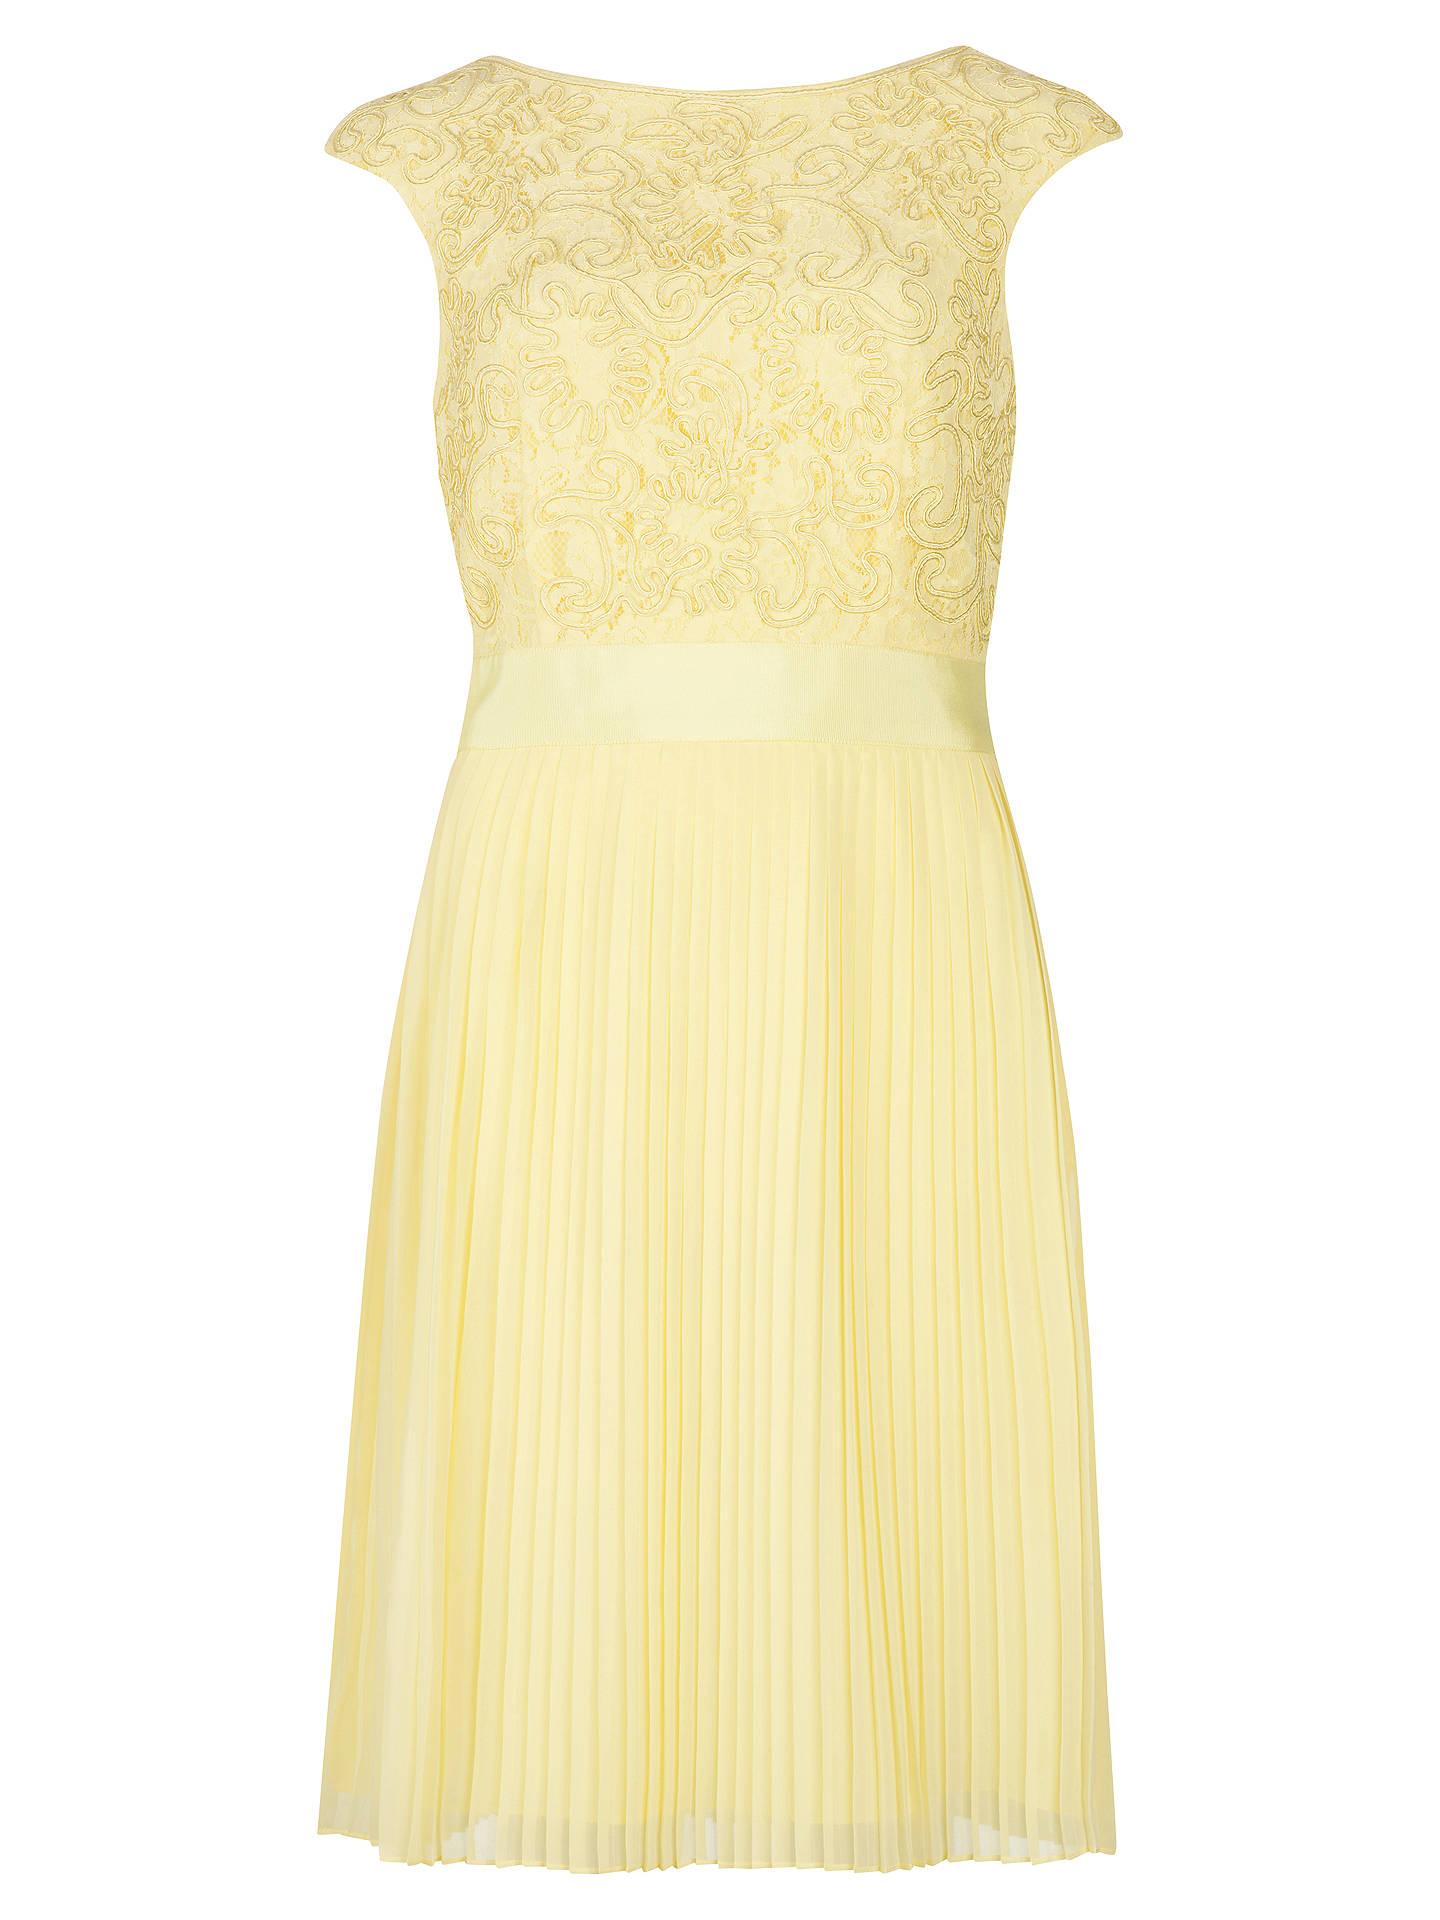 Ted Baker Aliana Lace Detail Dress, Lemon at John Lewis & Partners